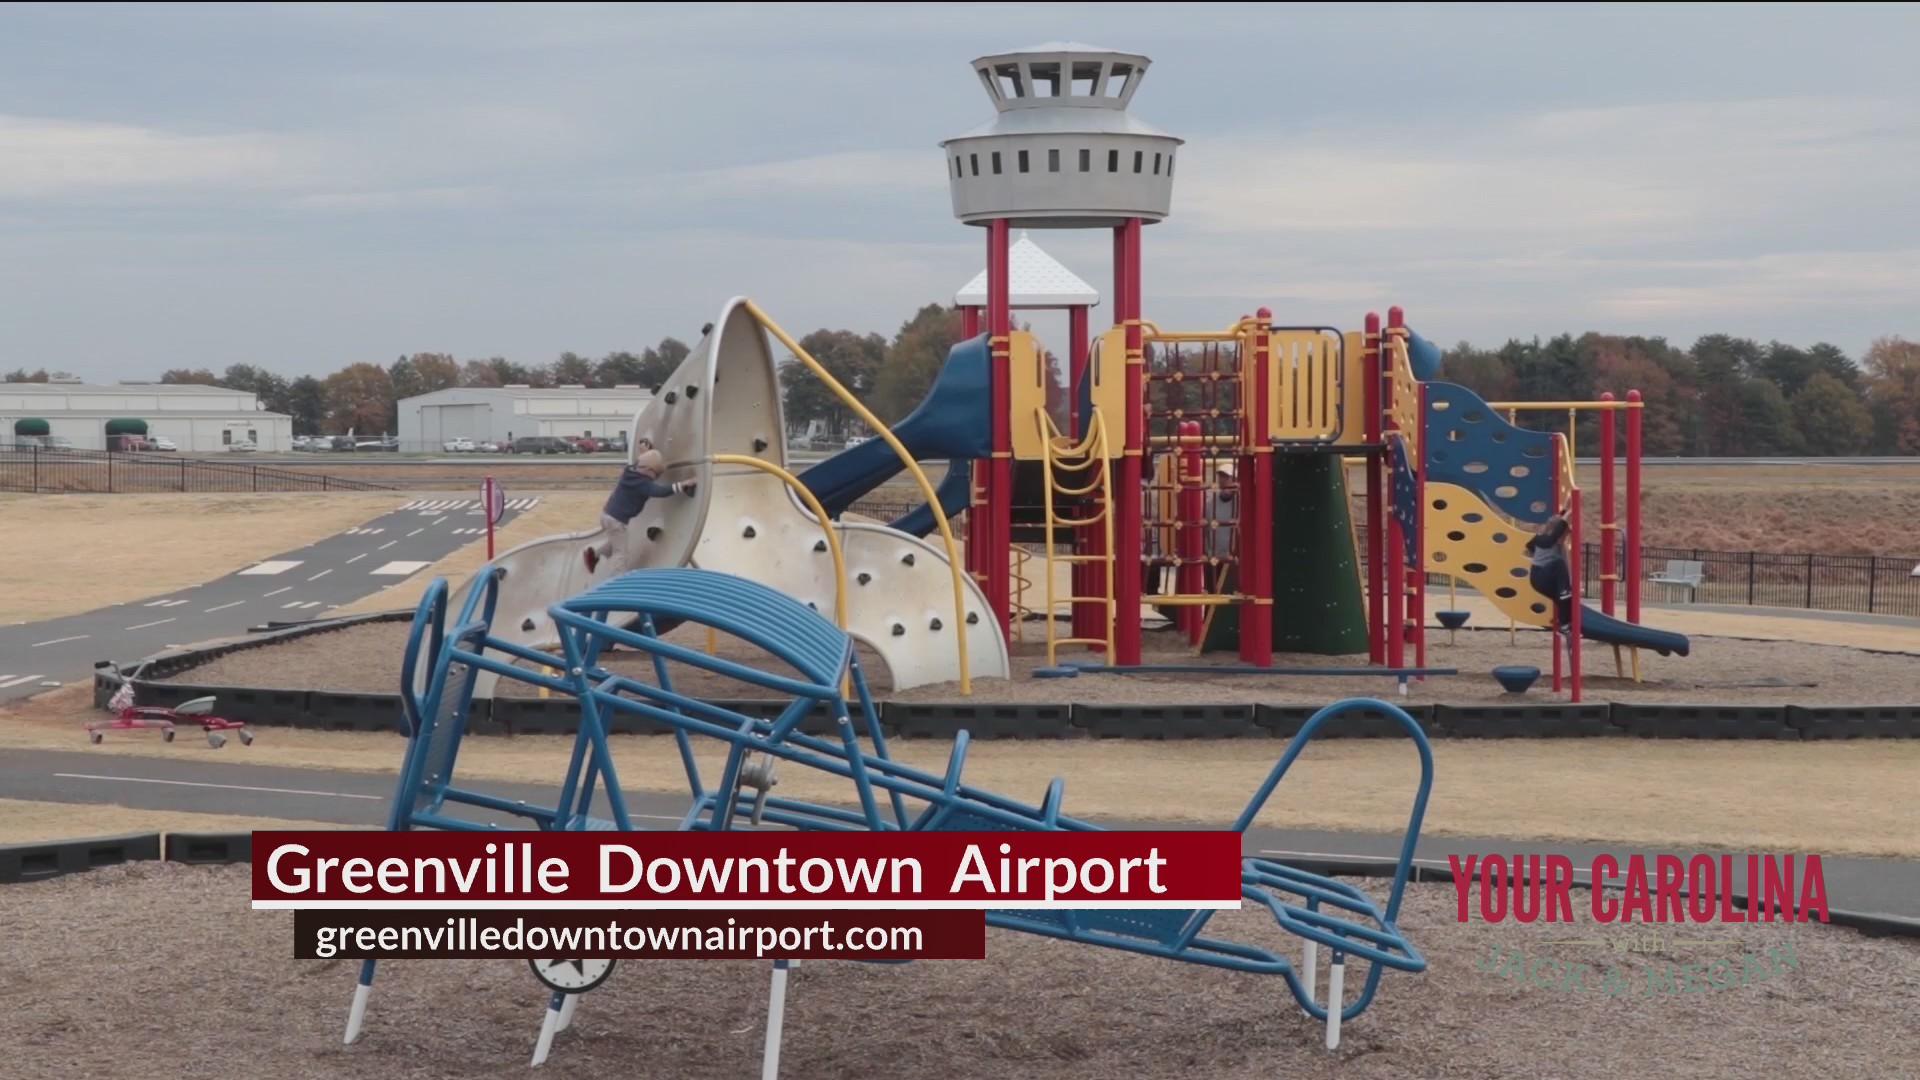 Popularity of Greenville's Runway Park soars